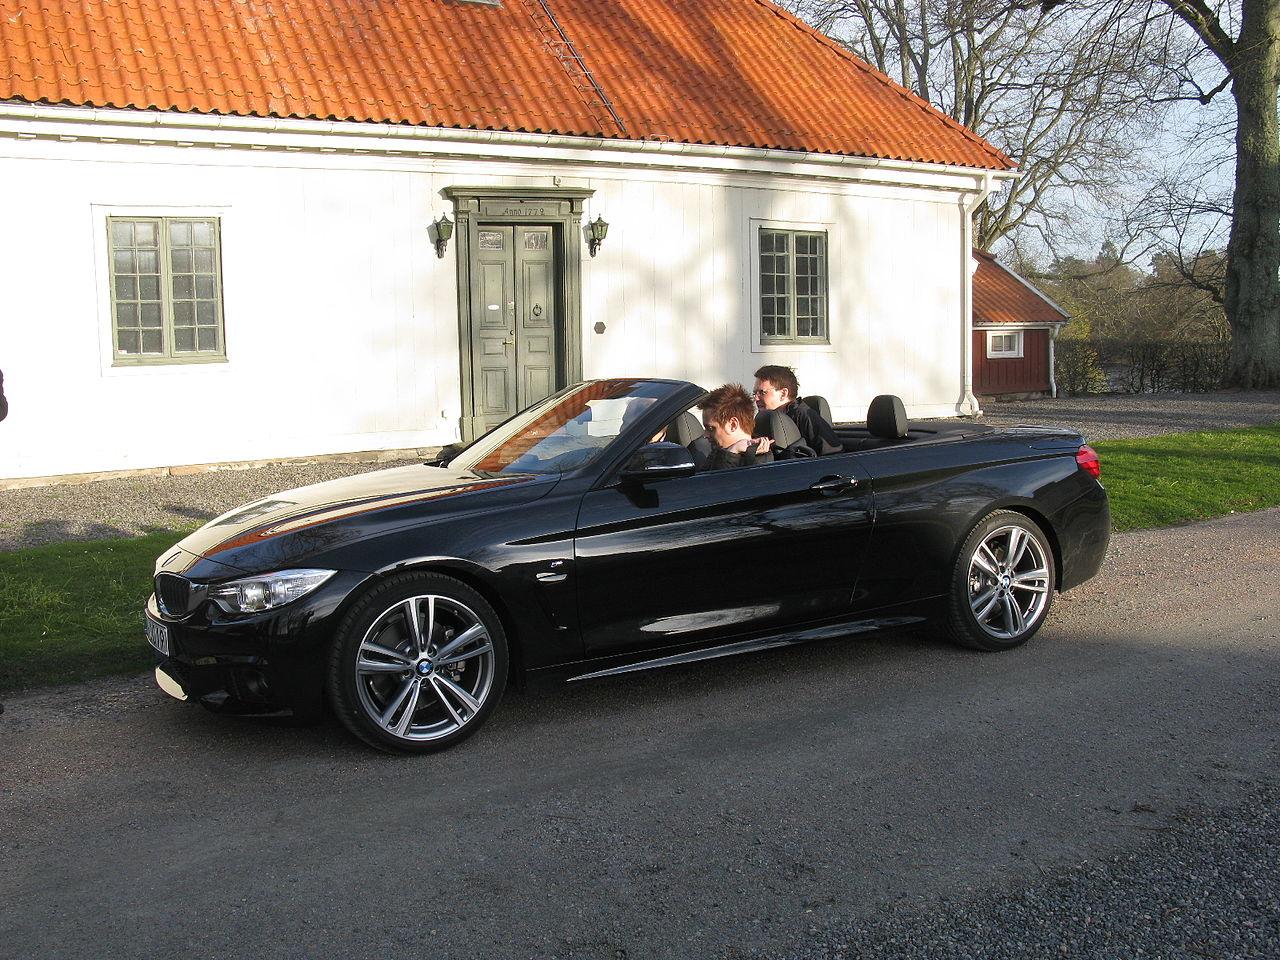 BMW Convertible bmw 428 m sport File:BMW 428i Cabriolet M Sport (13902132393).jpg - Wikimedia Commons